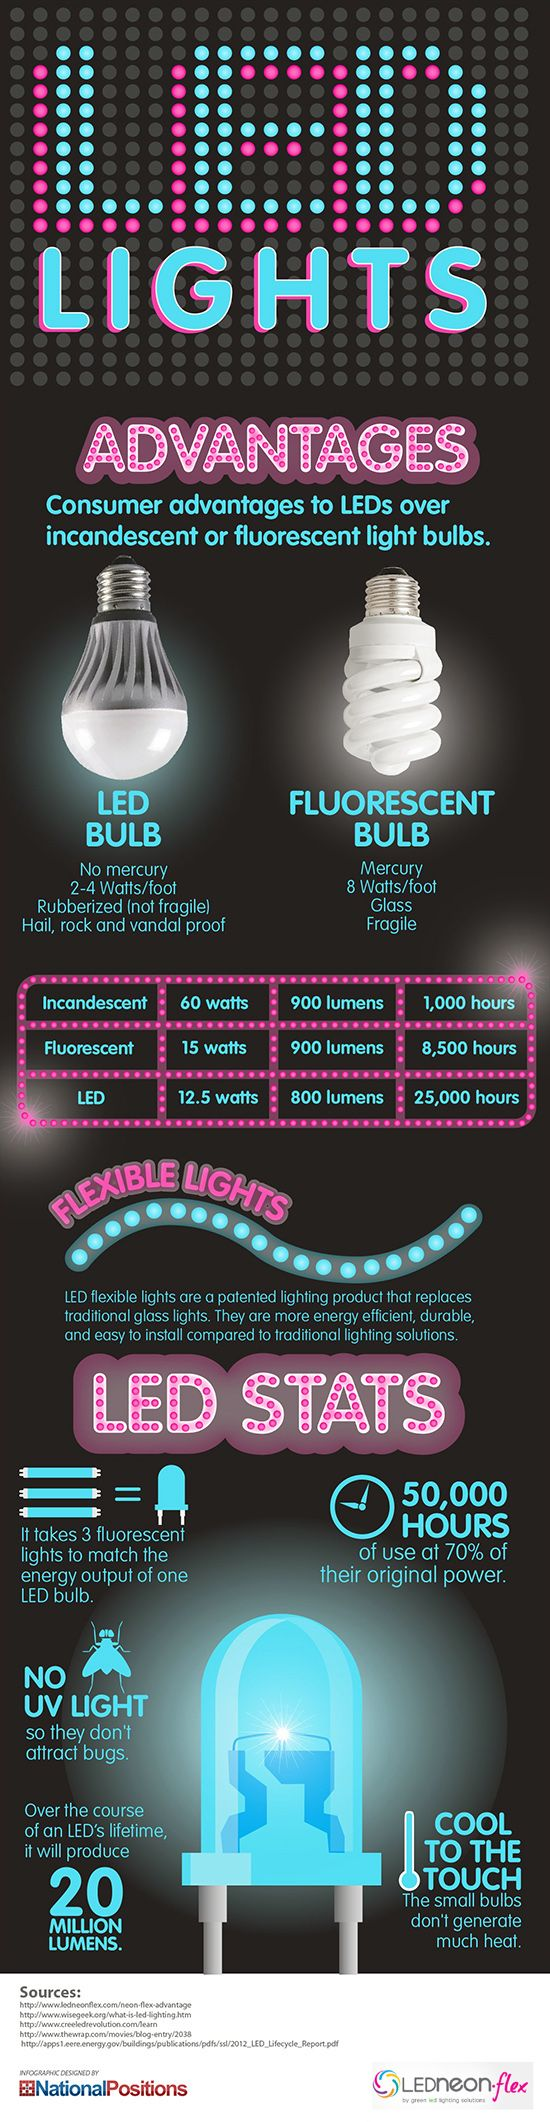 LED Lights: Advantages - LED Lights gold many advantages over traditional fluorescent bulbs.  - sponsored